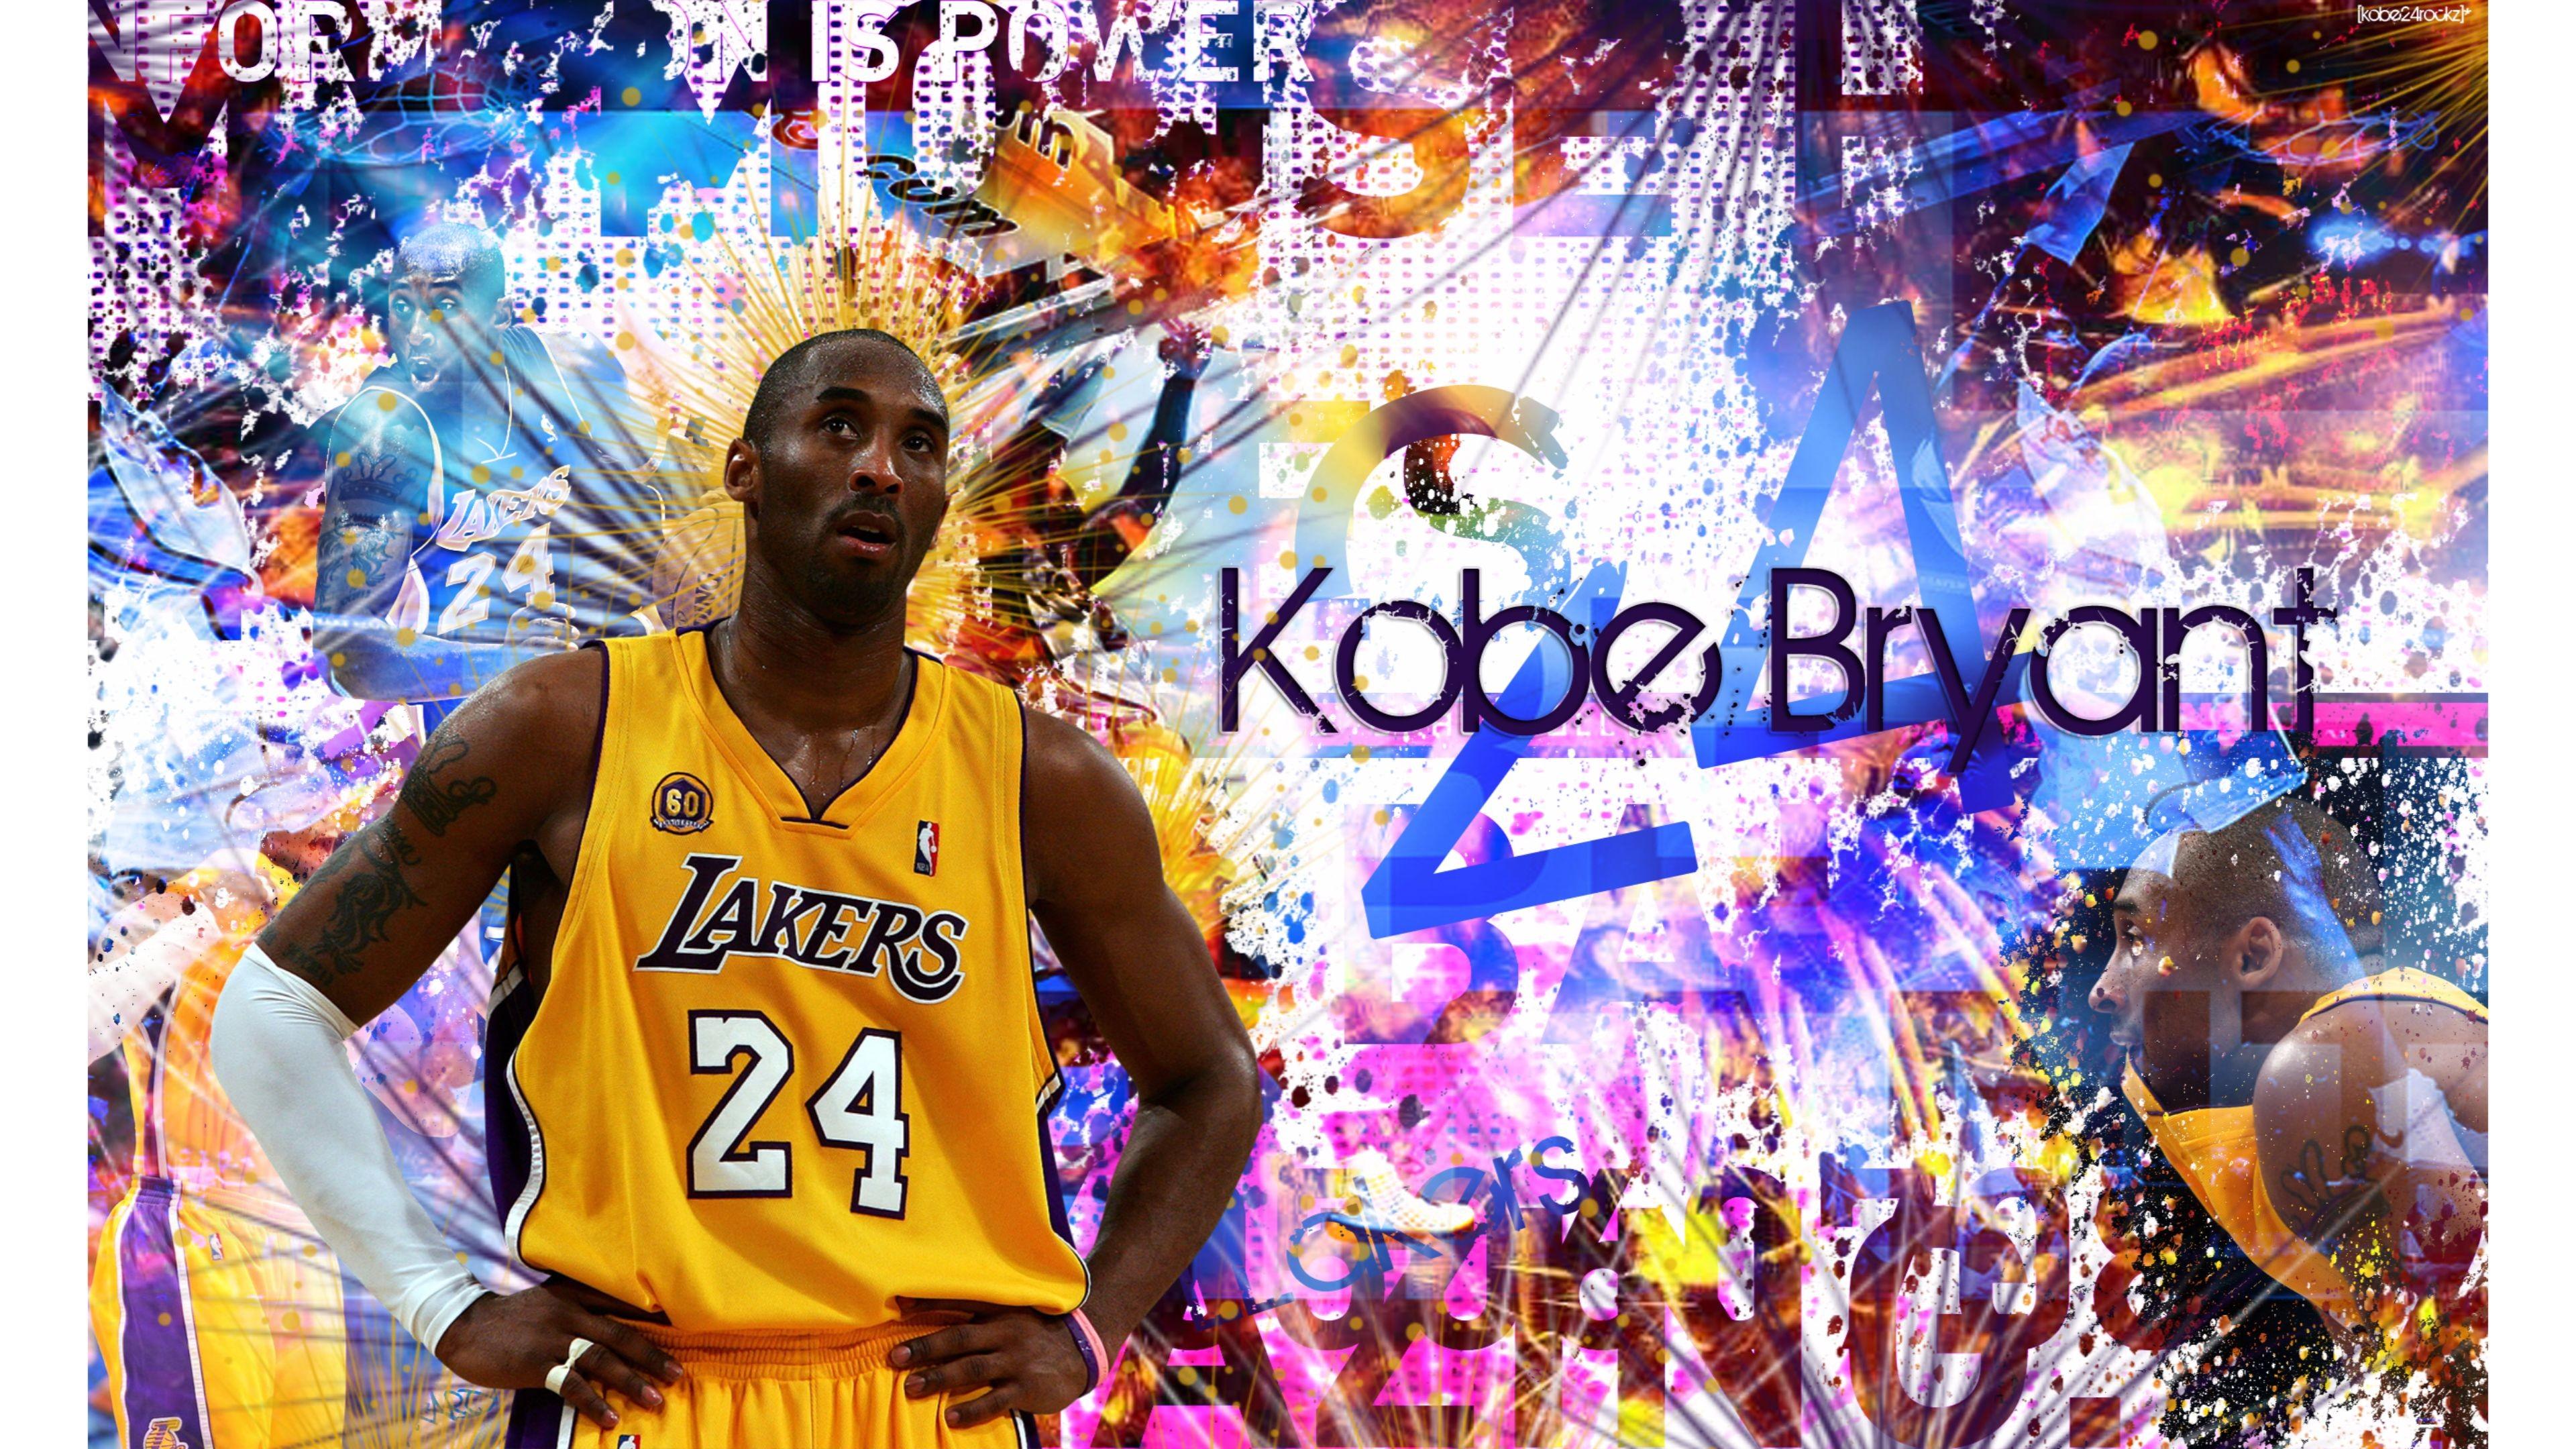 Kobe wallpapers 2018 65 images - Kobe bryant wallpaper free download ...